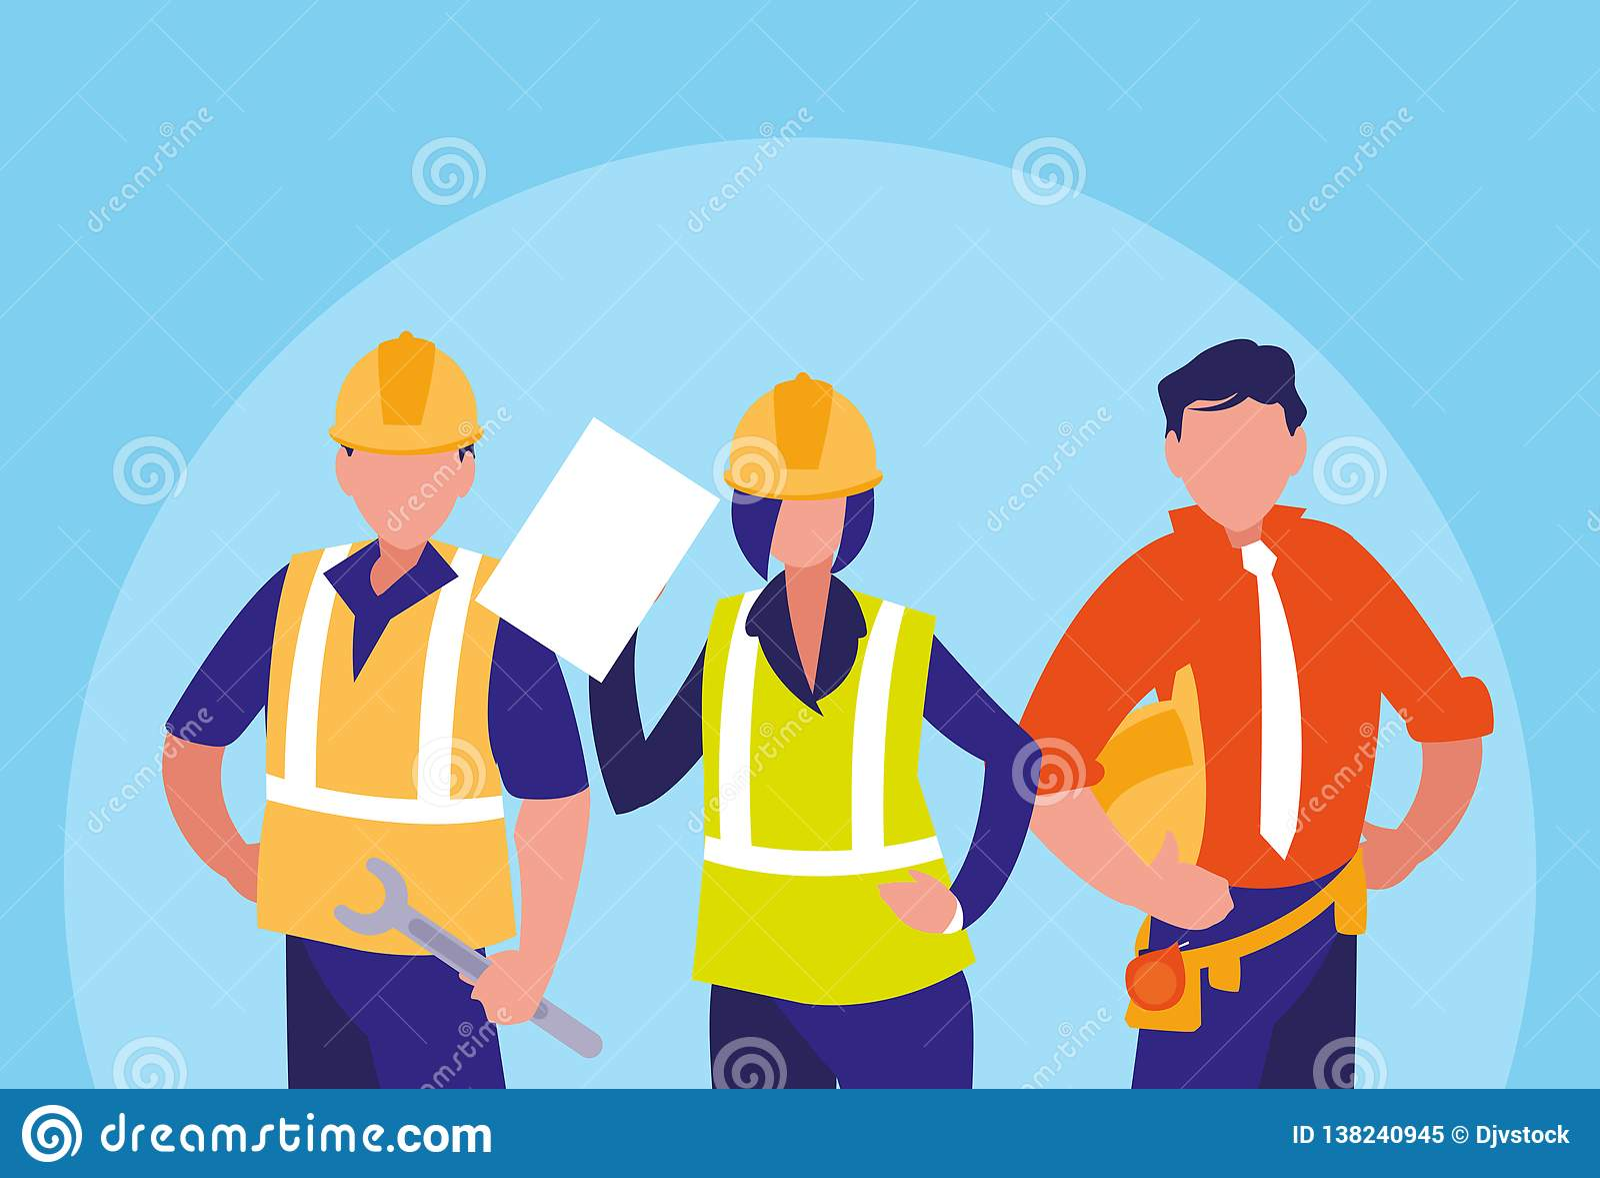 Grupa pracowników industrials avatar charakter